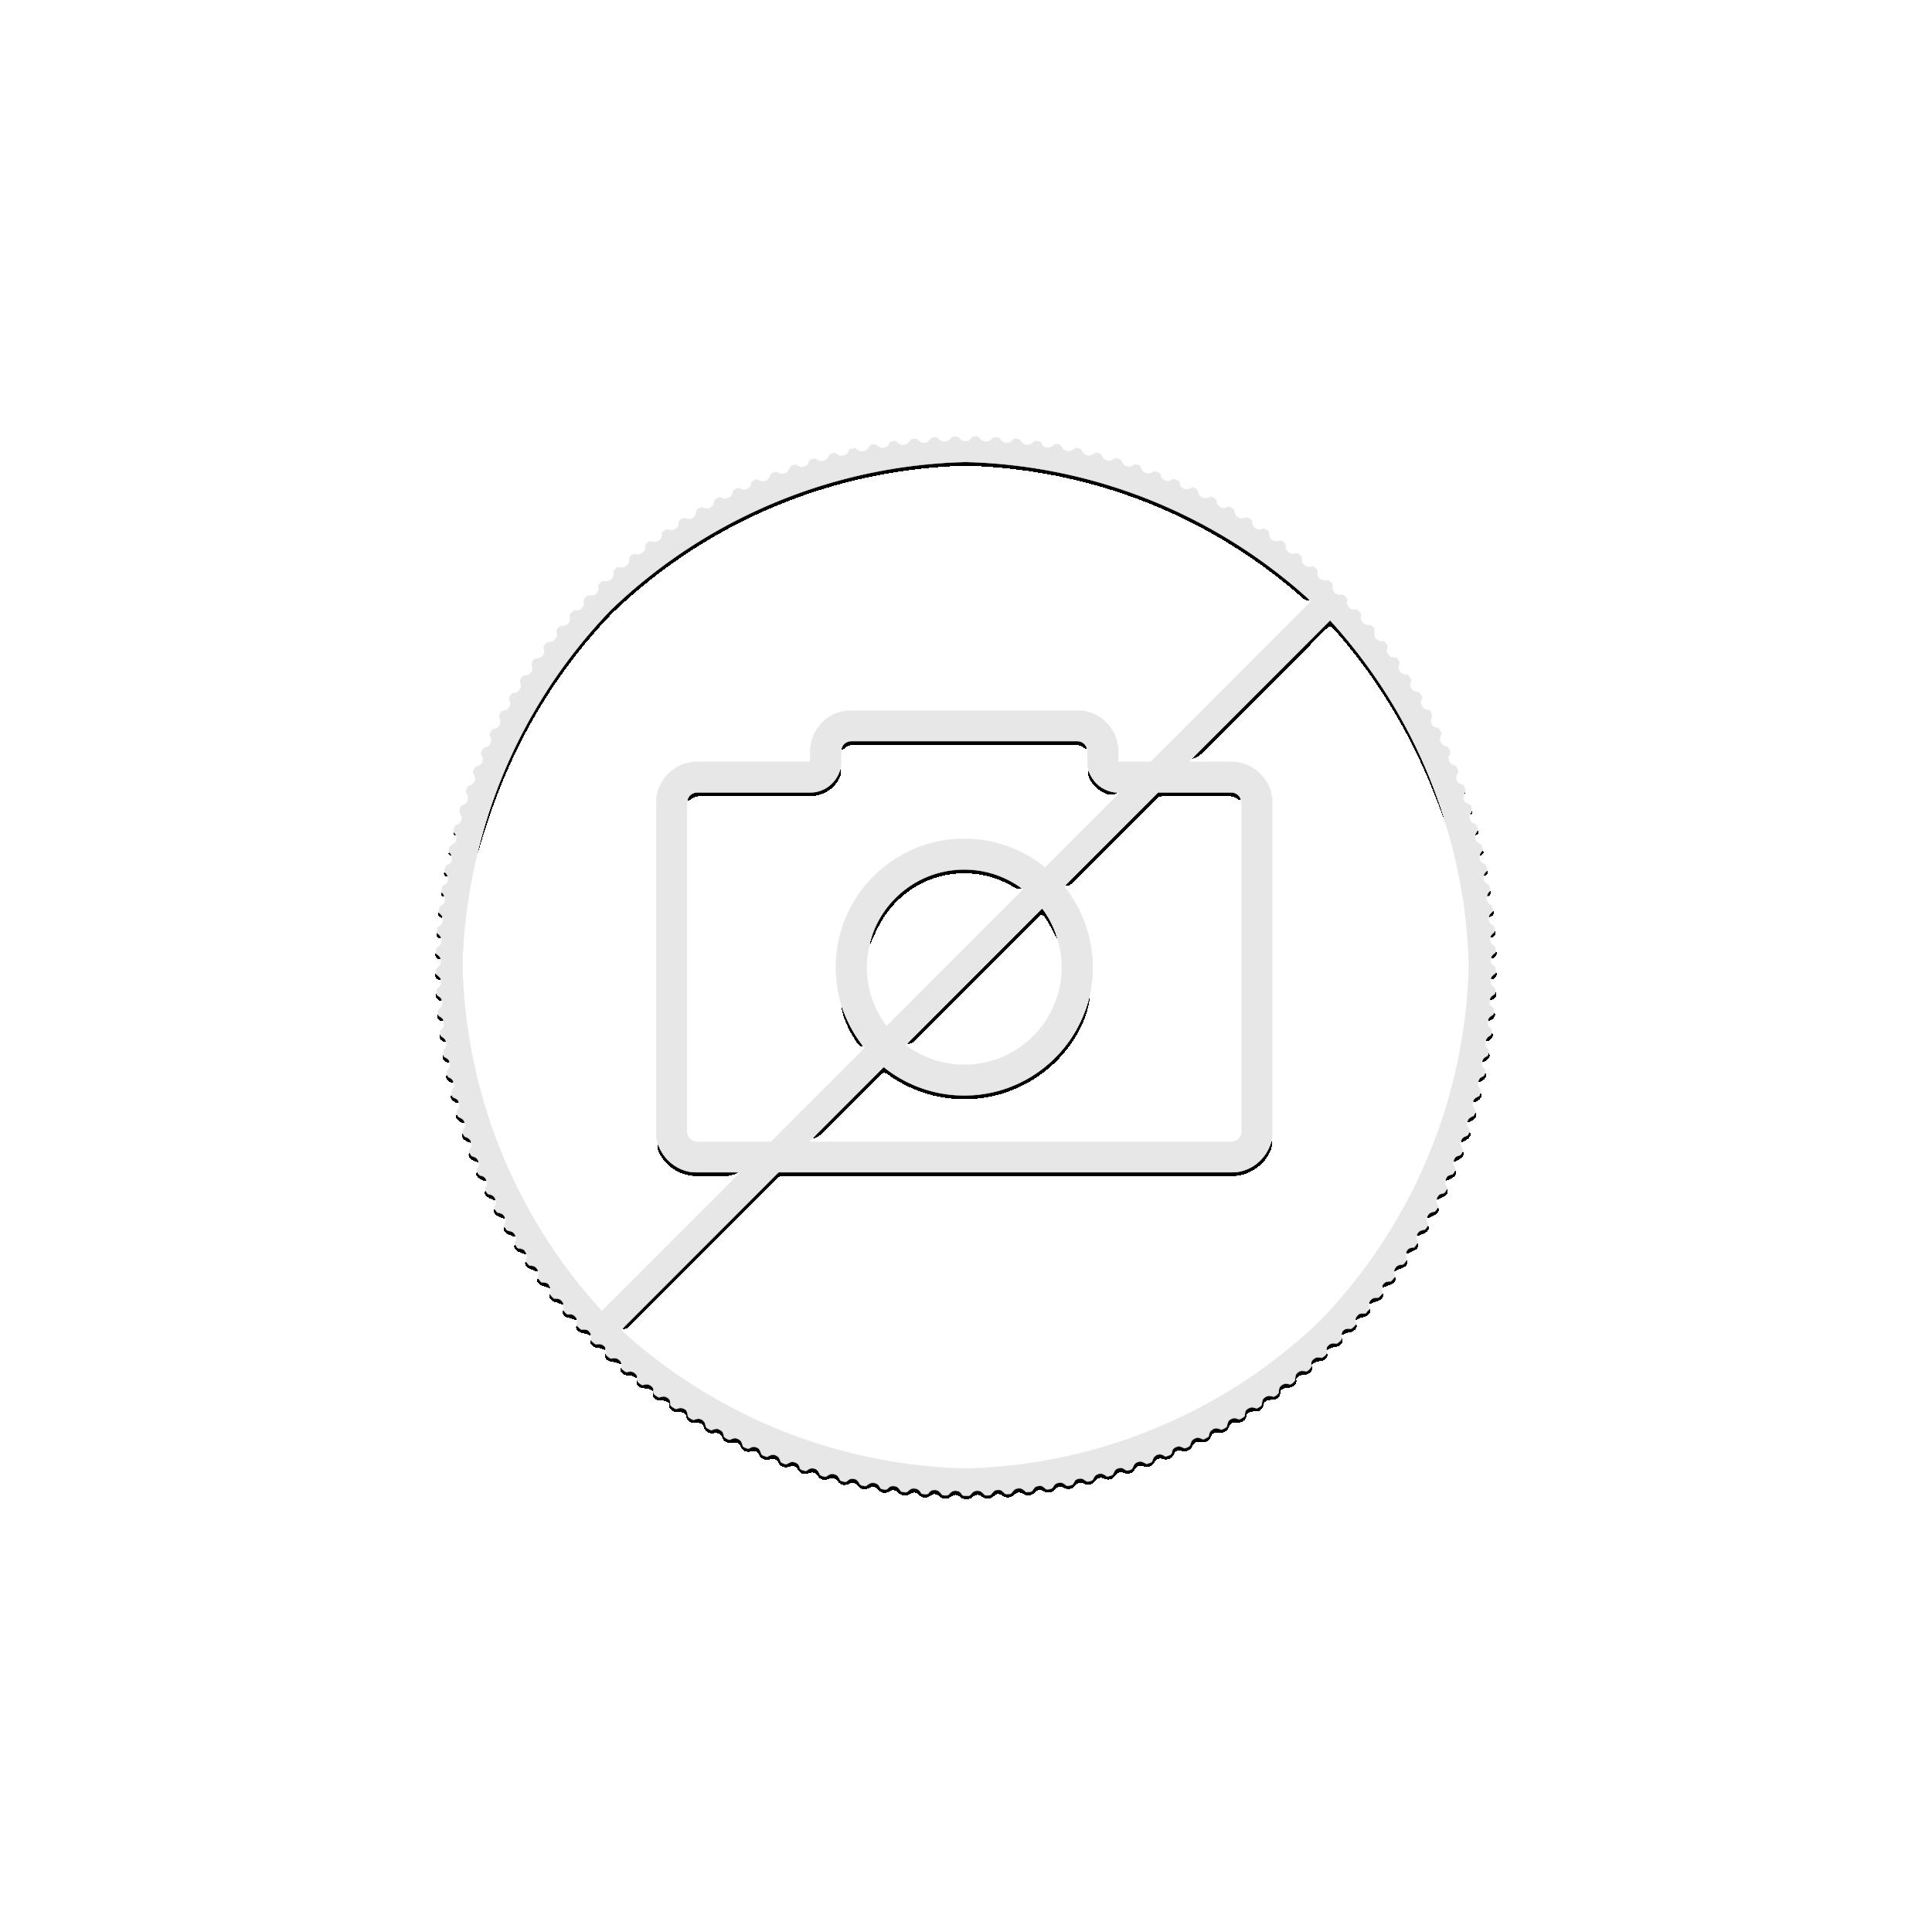 1 troy ounce silver coin Philharmonic 2020